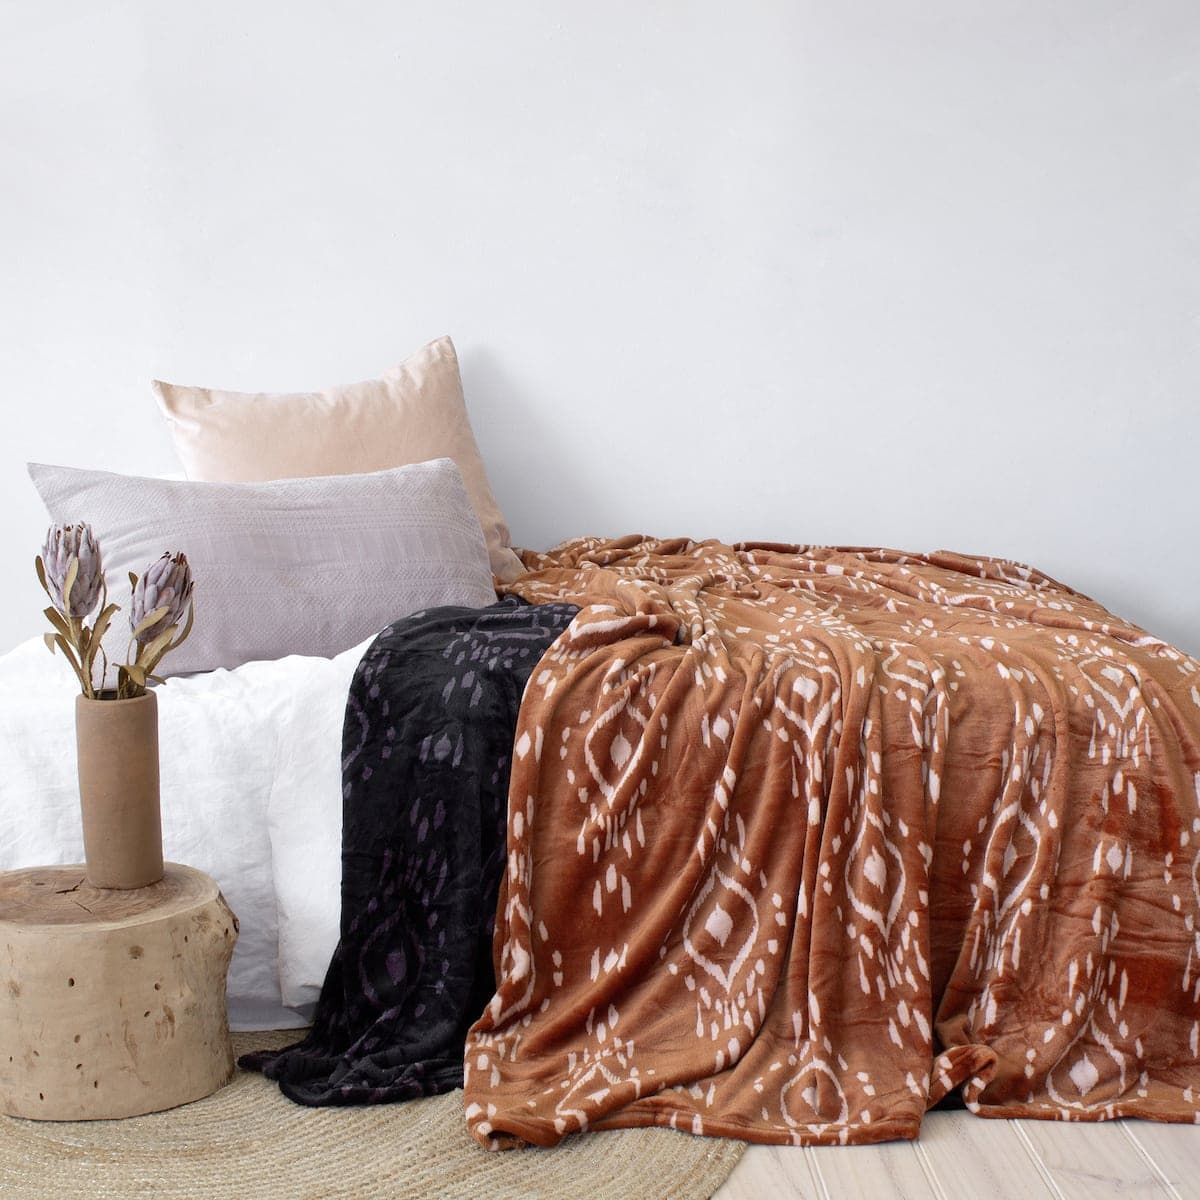 zuni ultra blush blanket affordable throw blanket orange with tribal pattern